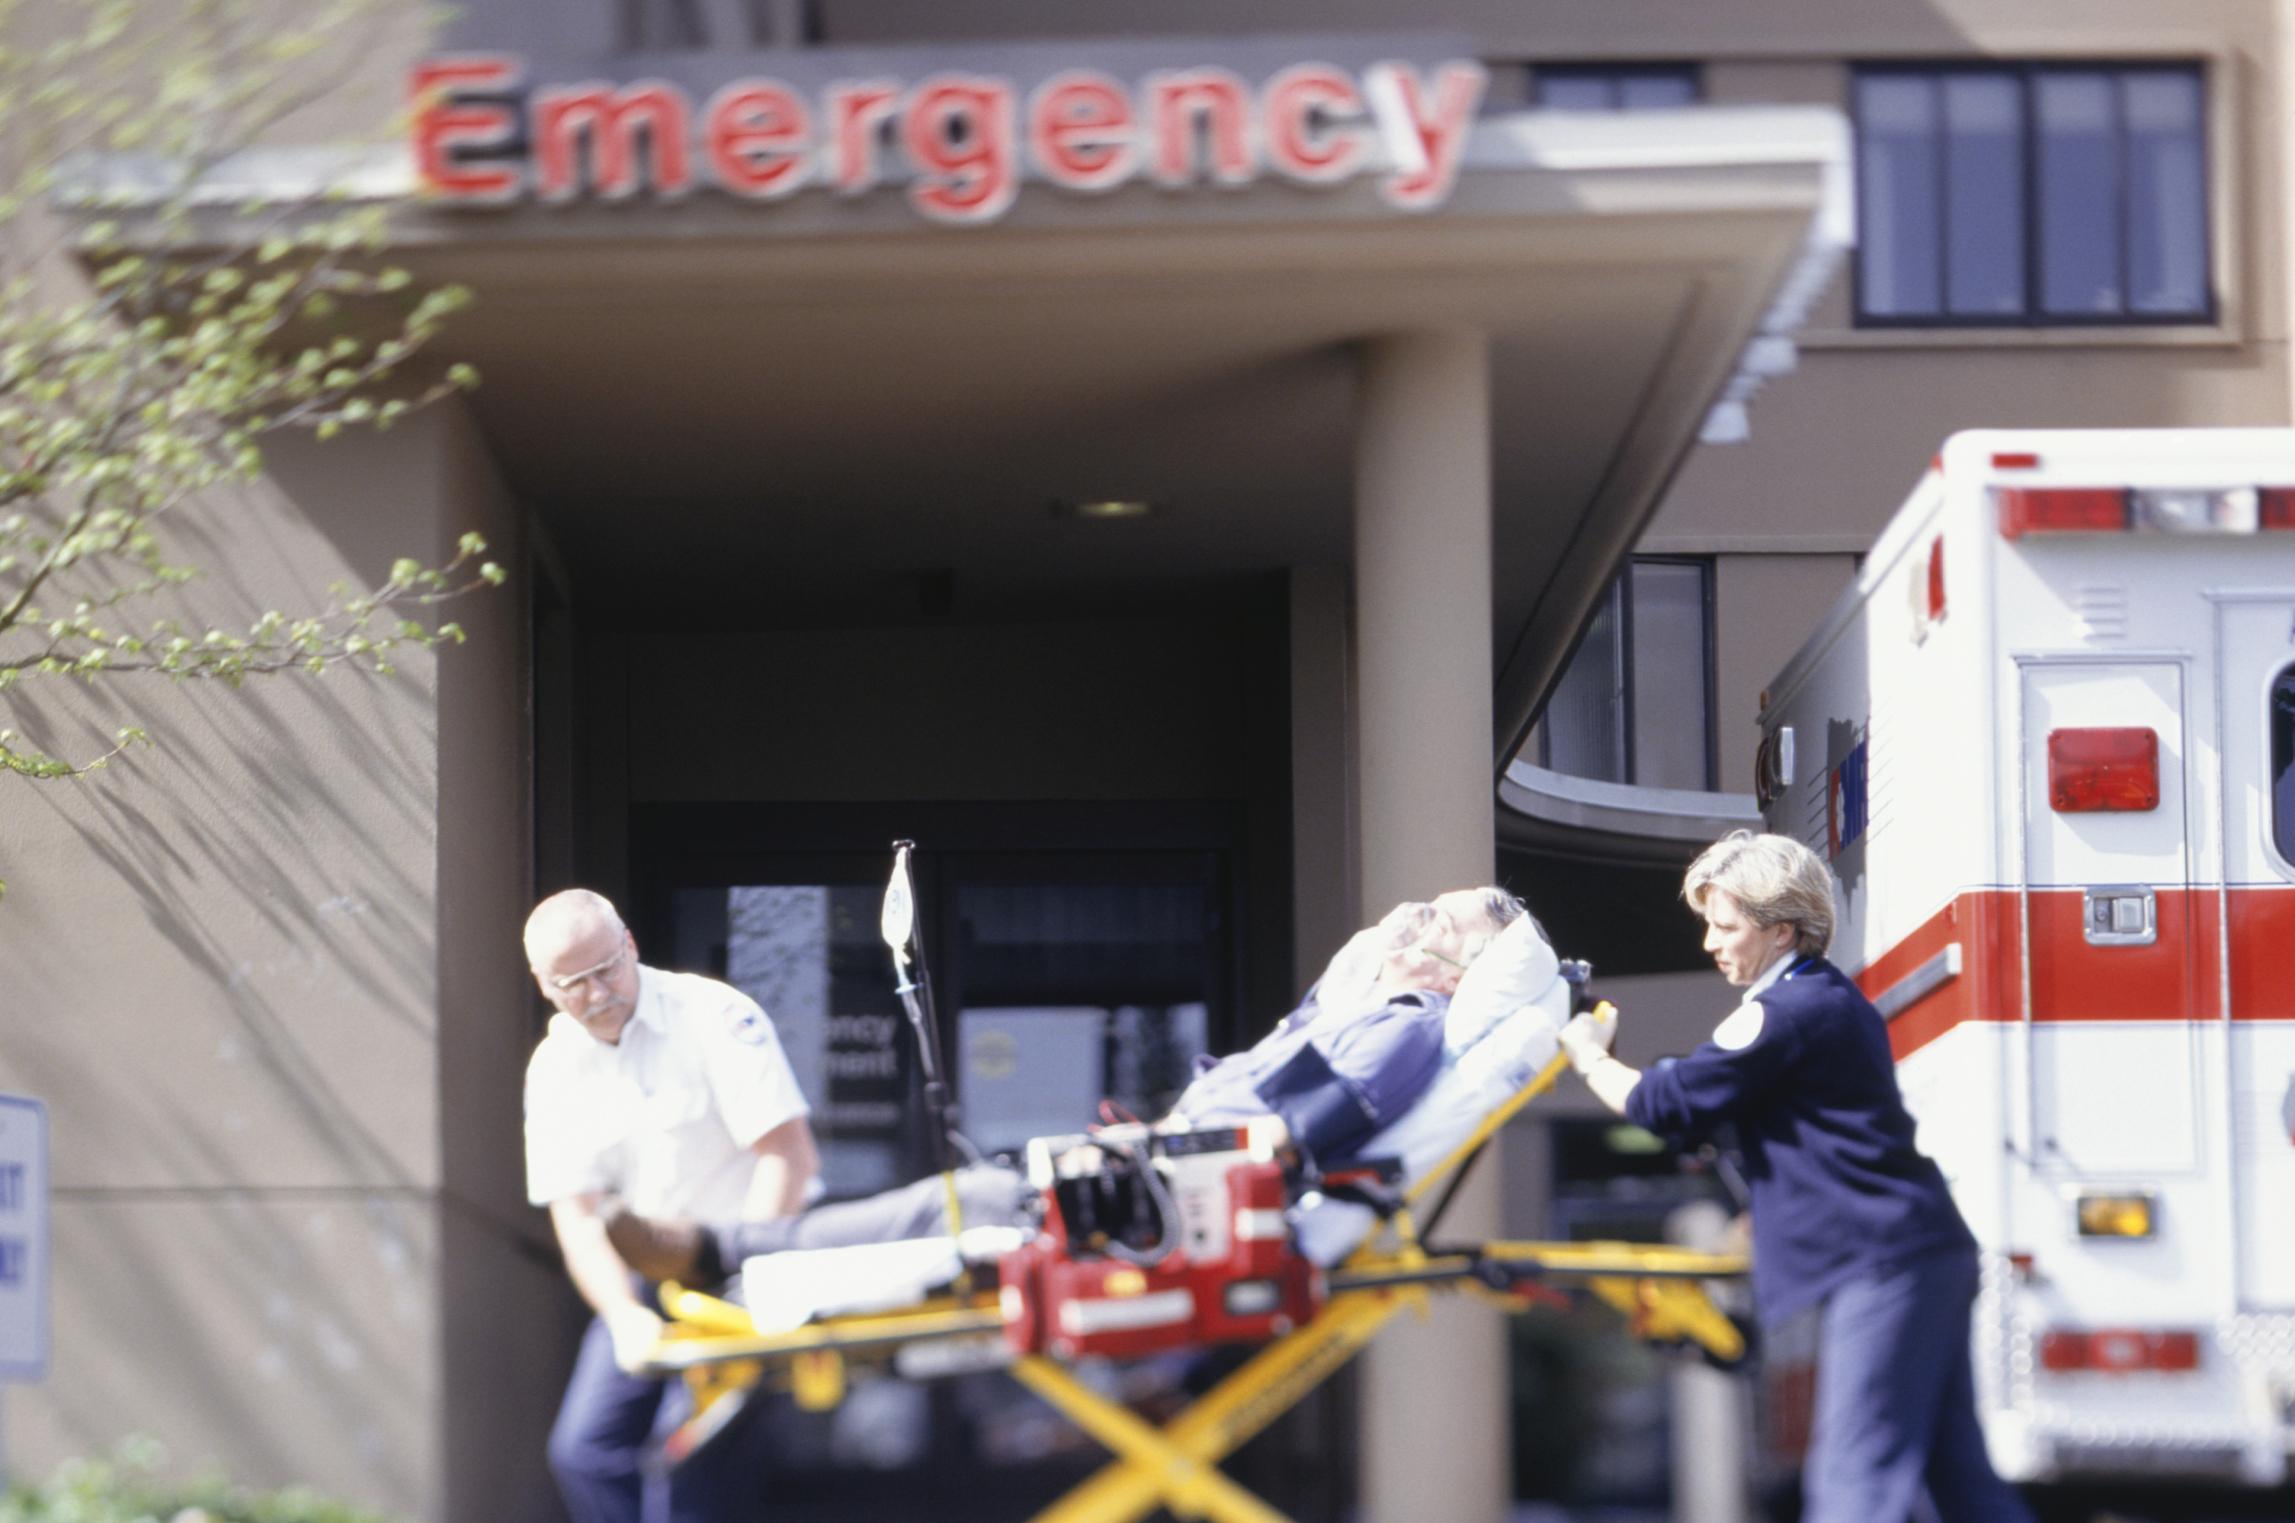 Emergency medical technician and high school